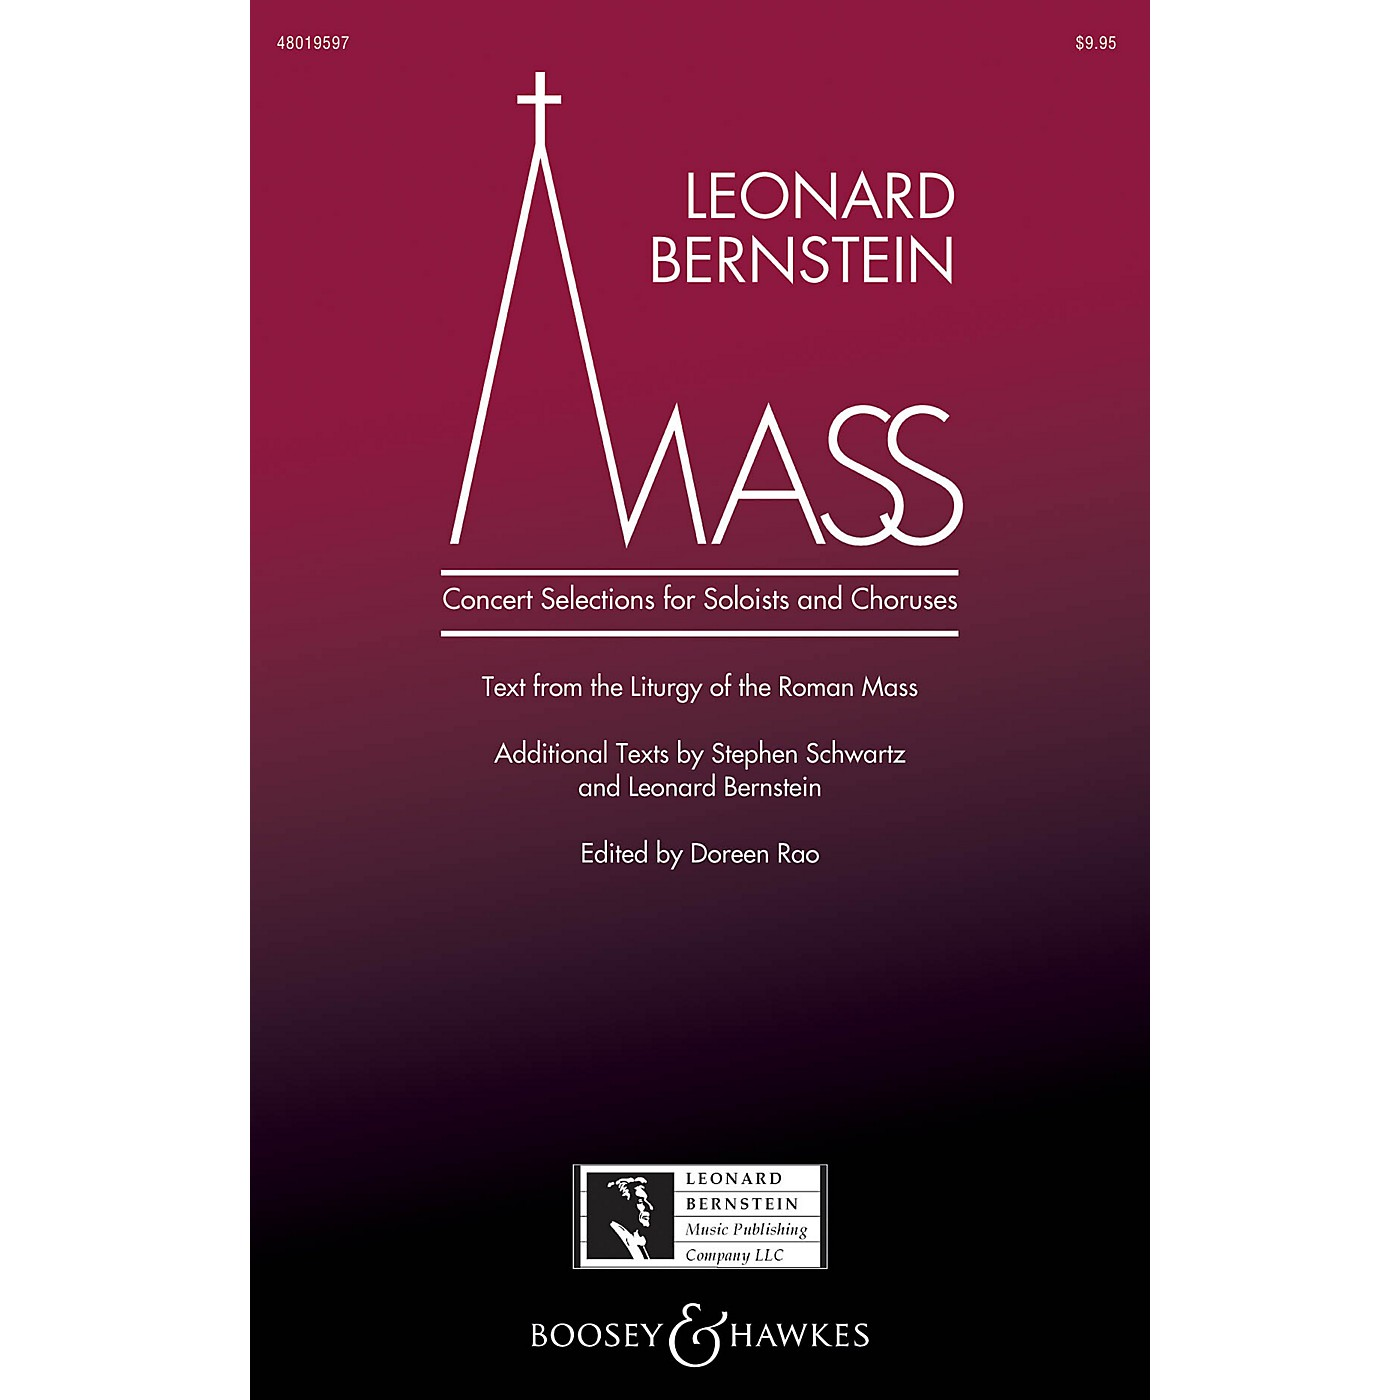 Leonard Bernstein Music Mass (Concert Selections for Soloists and Choruses) SATB Choir/Treble by Bernstein edited by Doreen Rao thumbnail